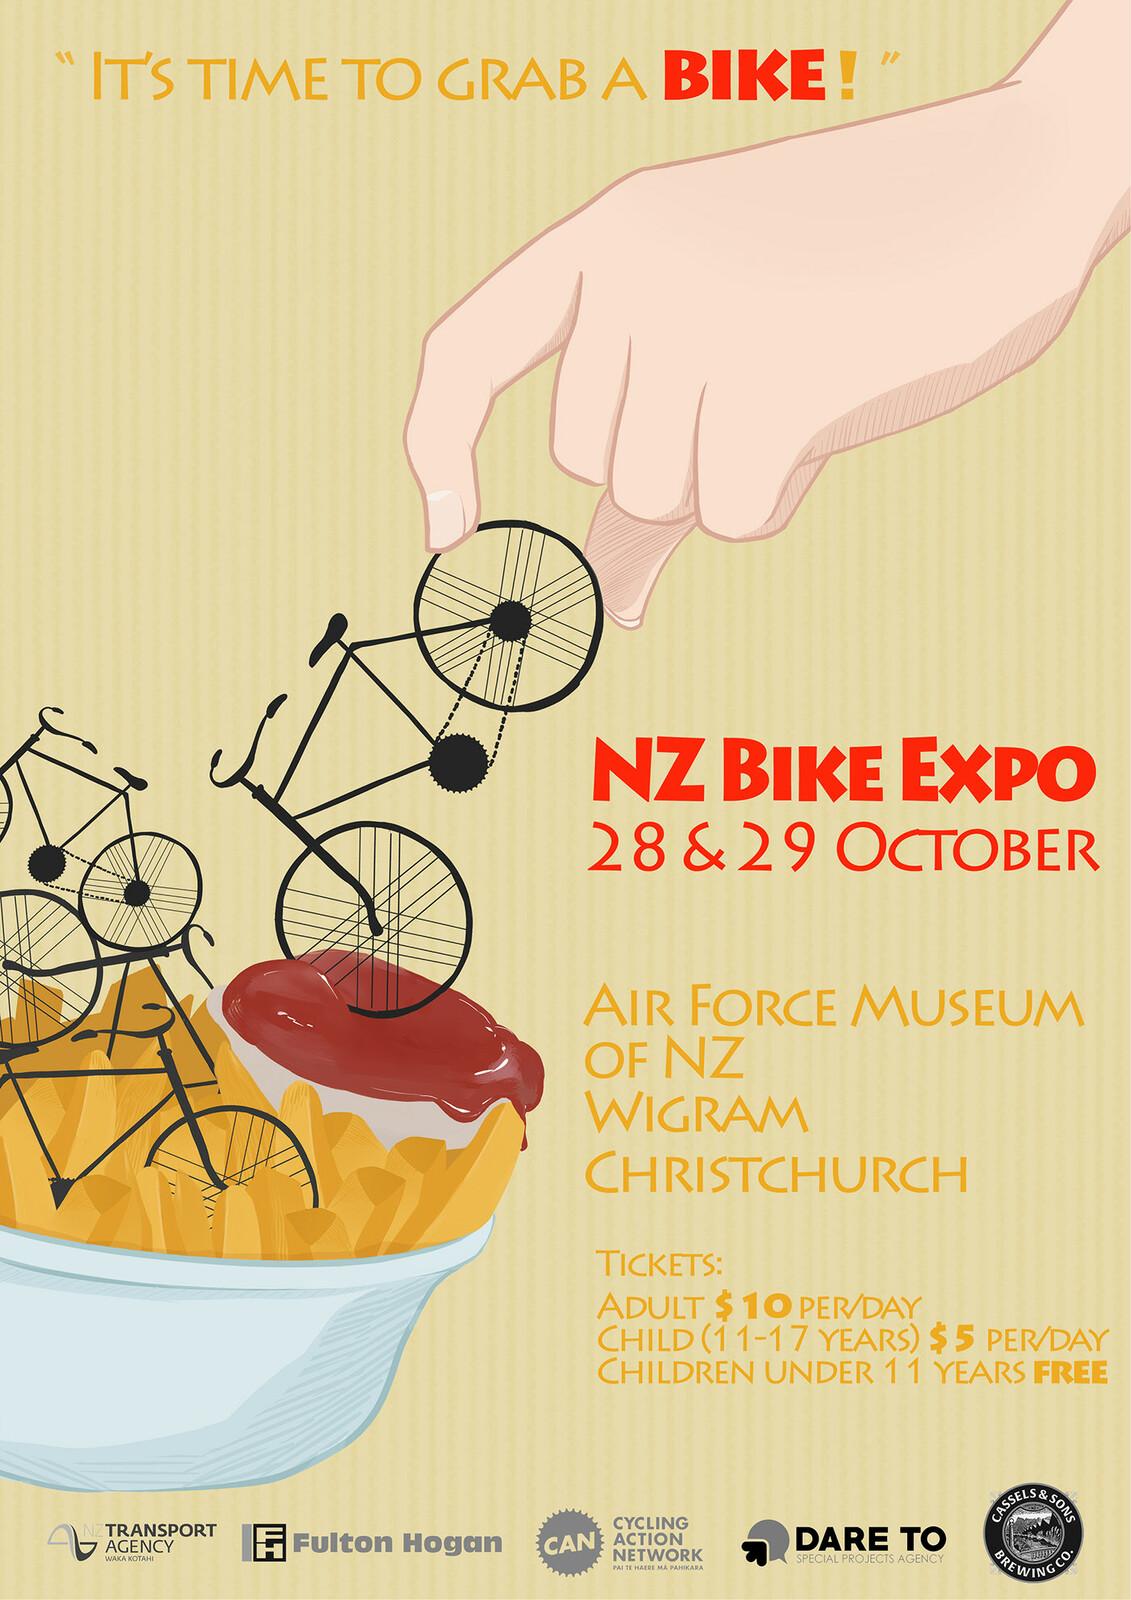 NZ Bike Expo 2017 Poster